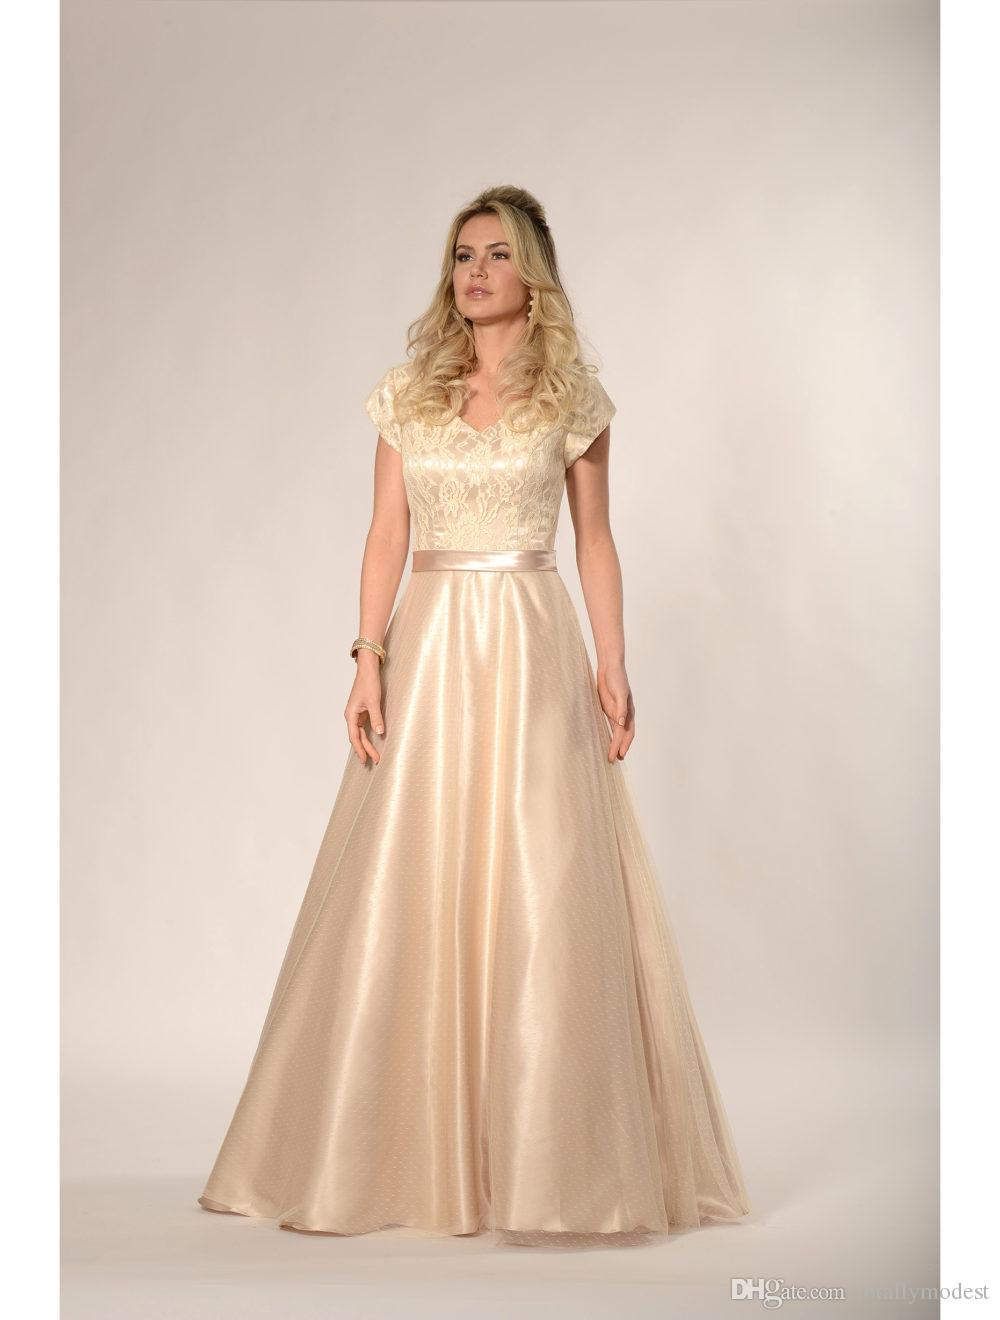 V-Ausschnitt Lace Top Tüll Rock Modest Brautjungfer Kleider mit Kappenärmeln Satin Gürtel Rustikal Land Western Brautjungfer Robes Maß